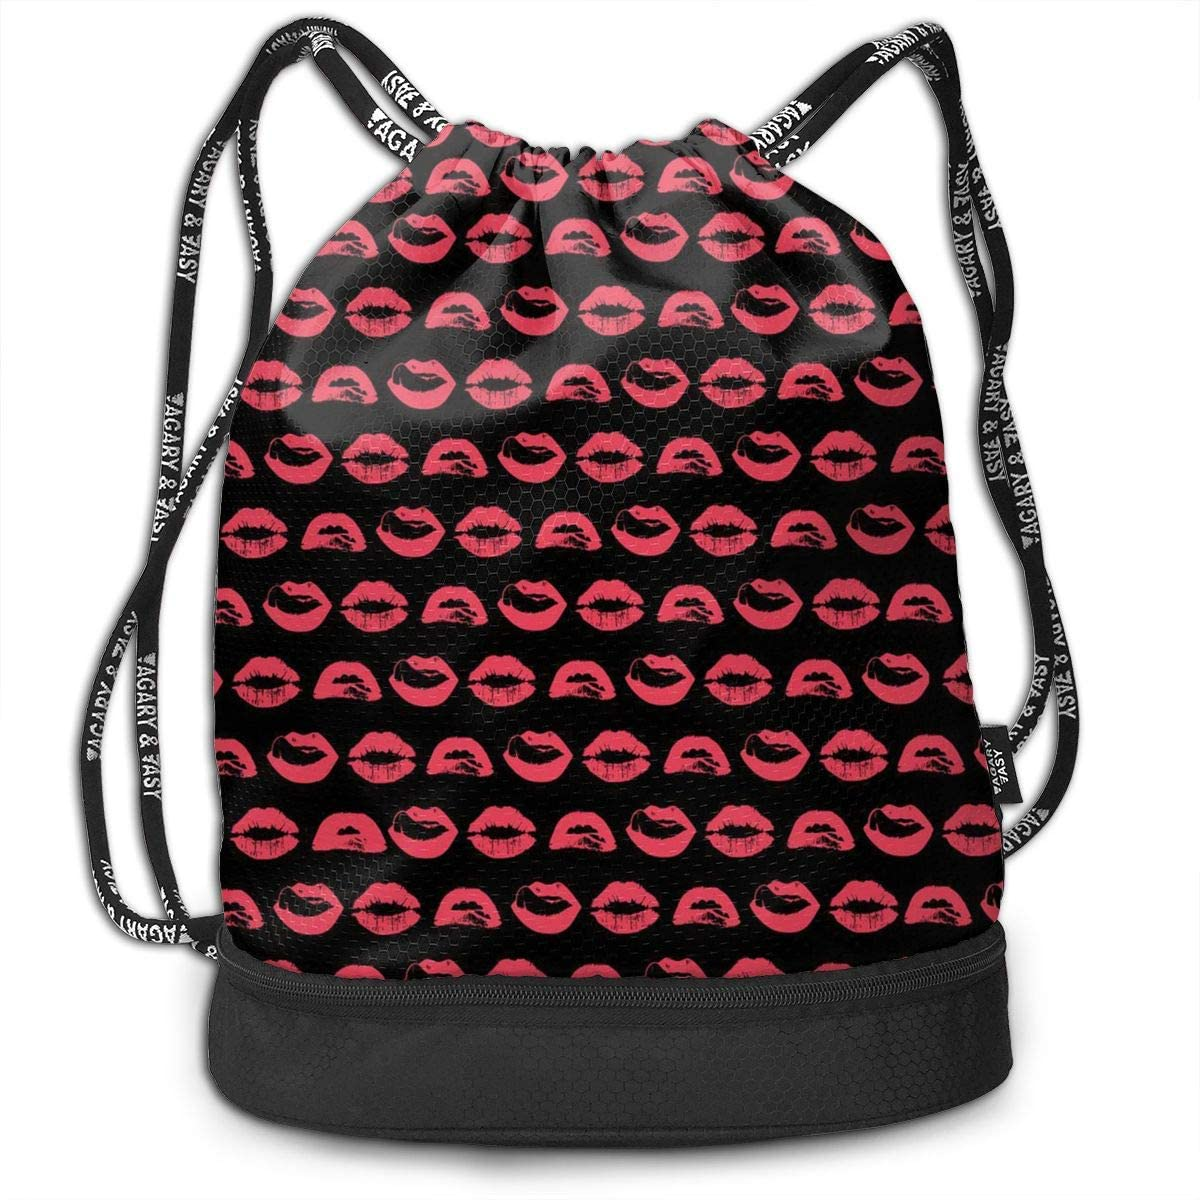 Bundle Backpacks Pink Stripe Lips Gym Sack Drawstring Bags Casual Daypack Yoga Bag School Training Pouch